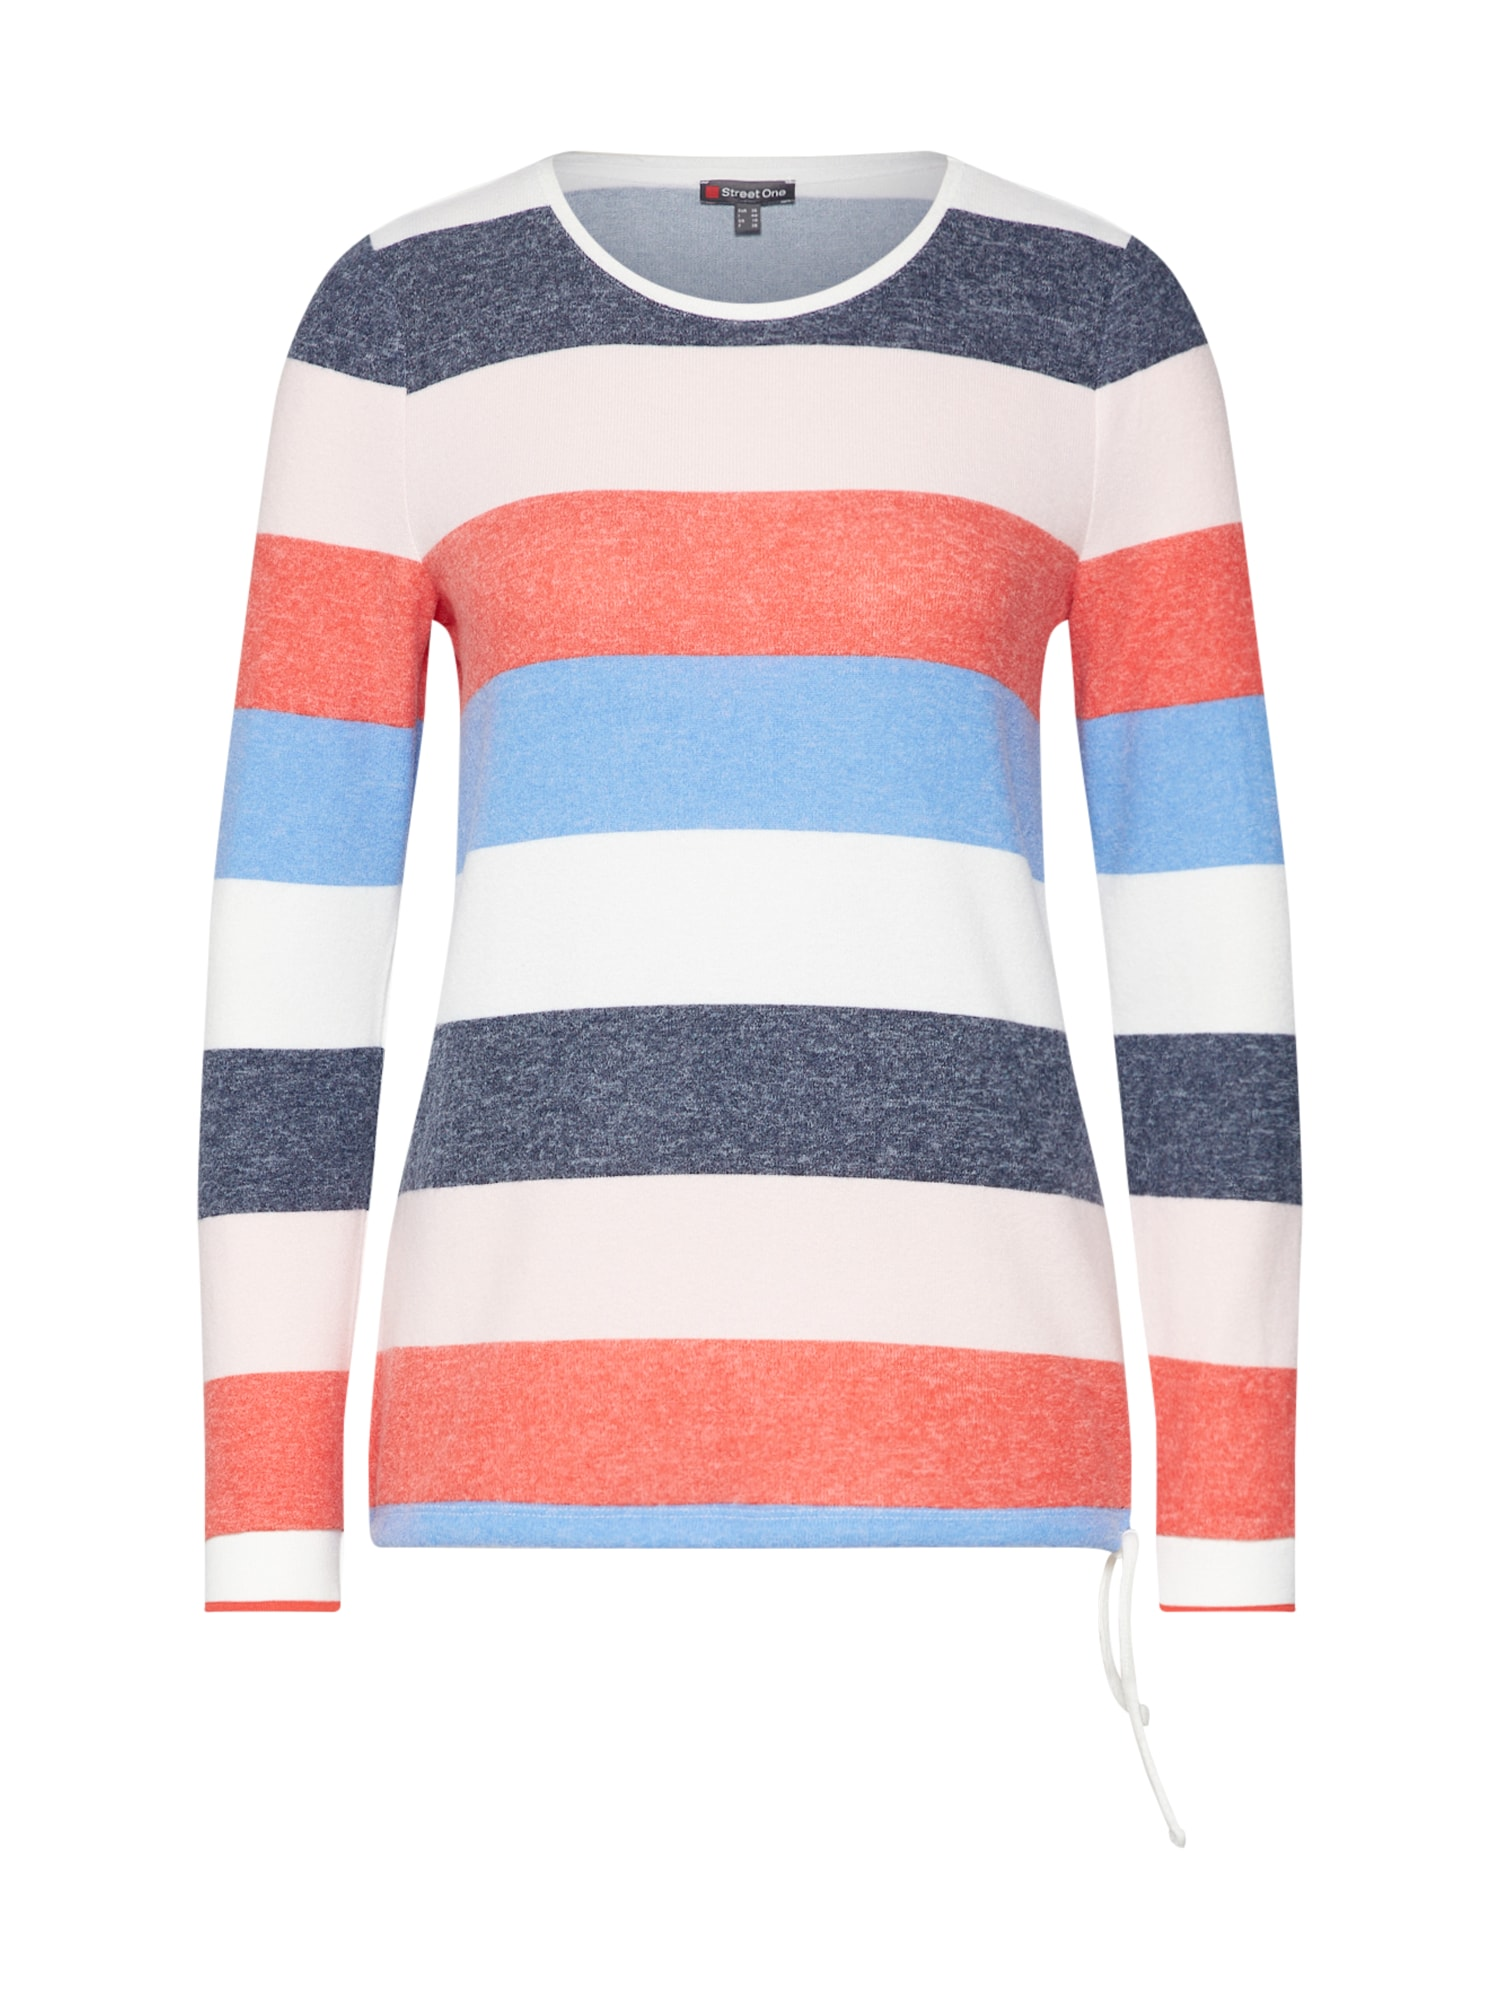 Tričko Loralie tmavě modrá mix barev STREET ONE